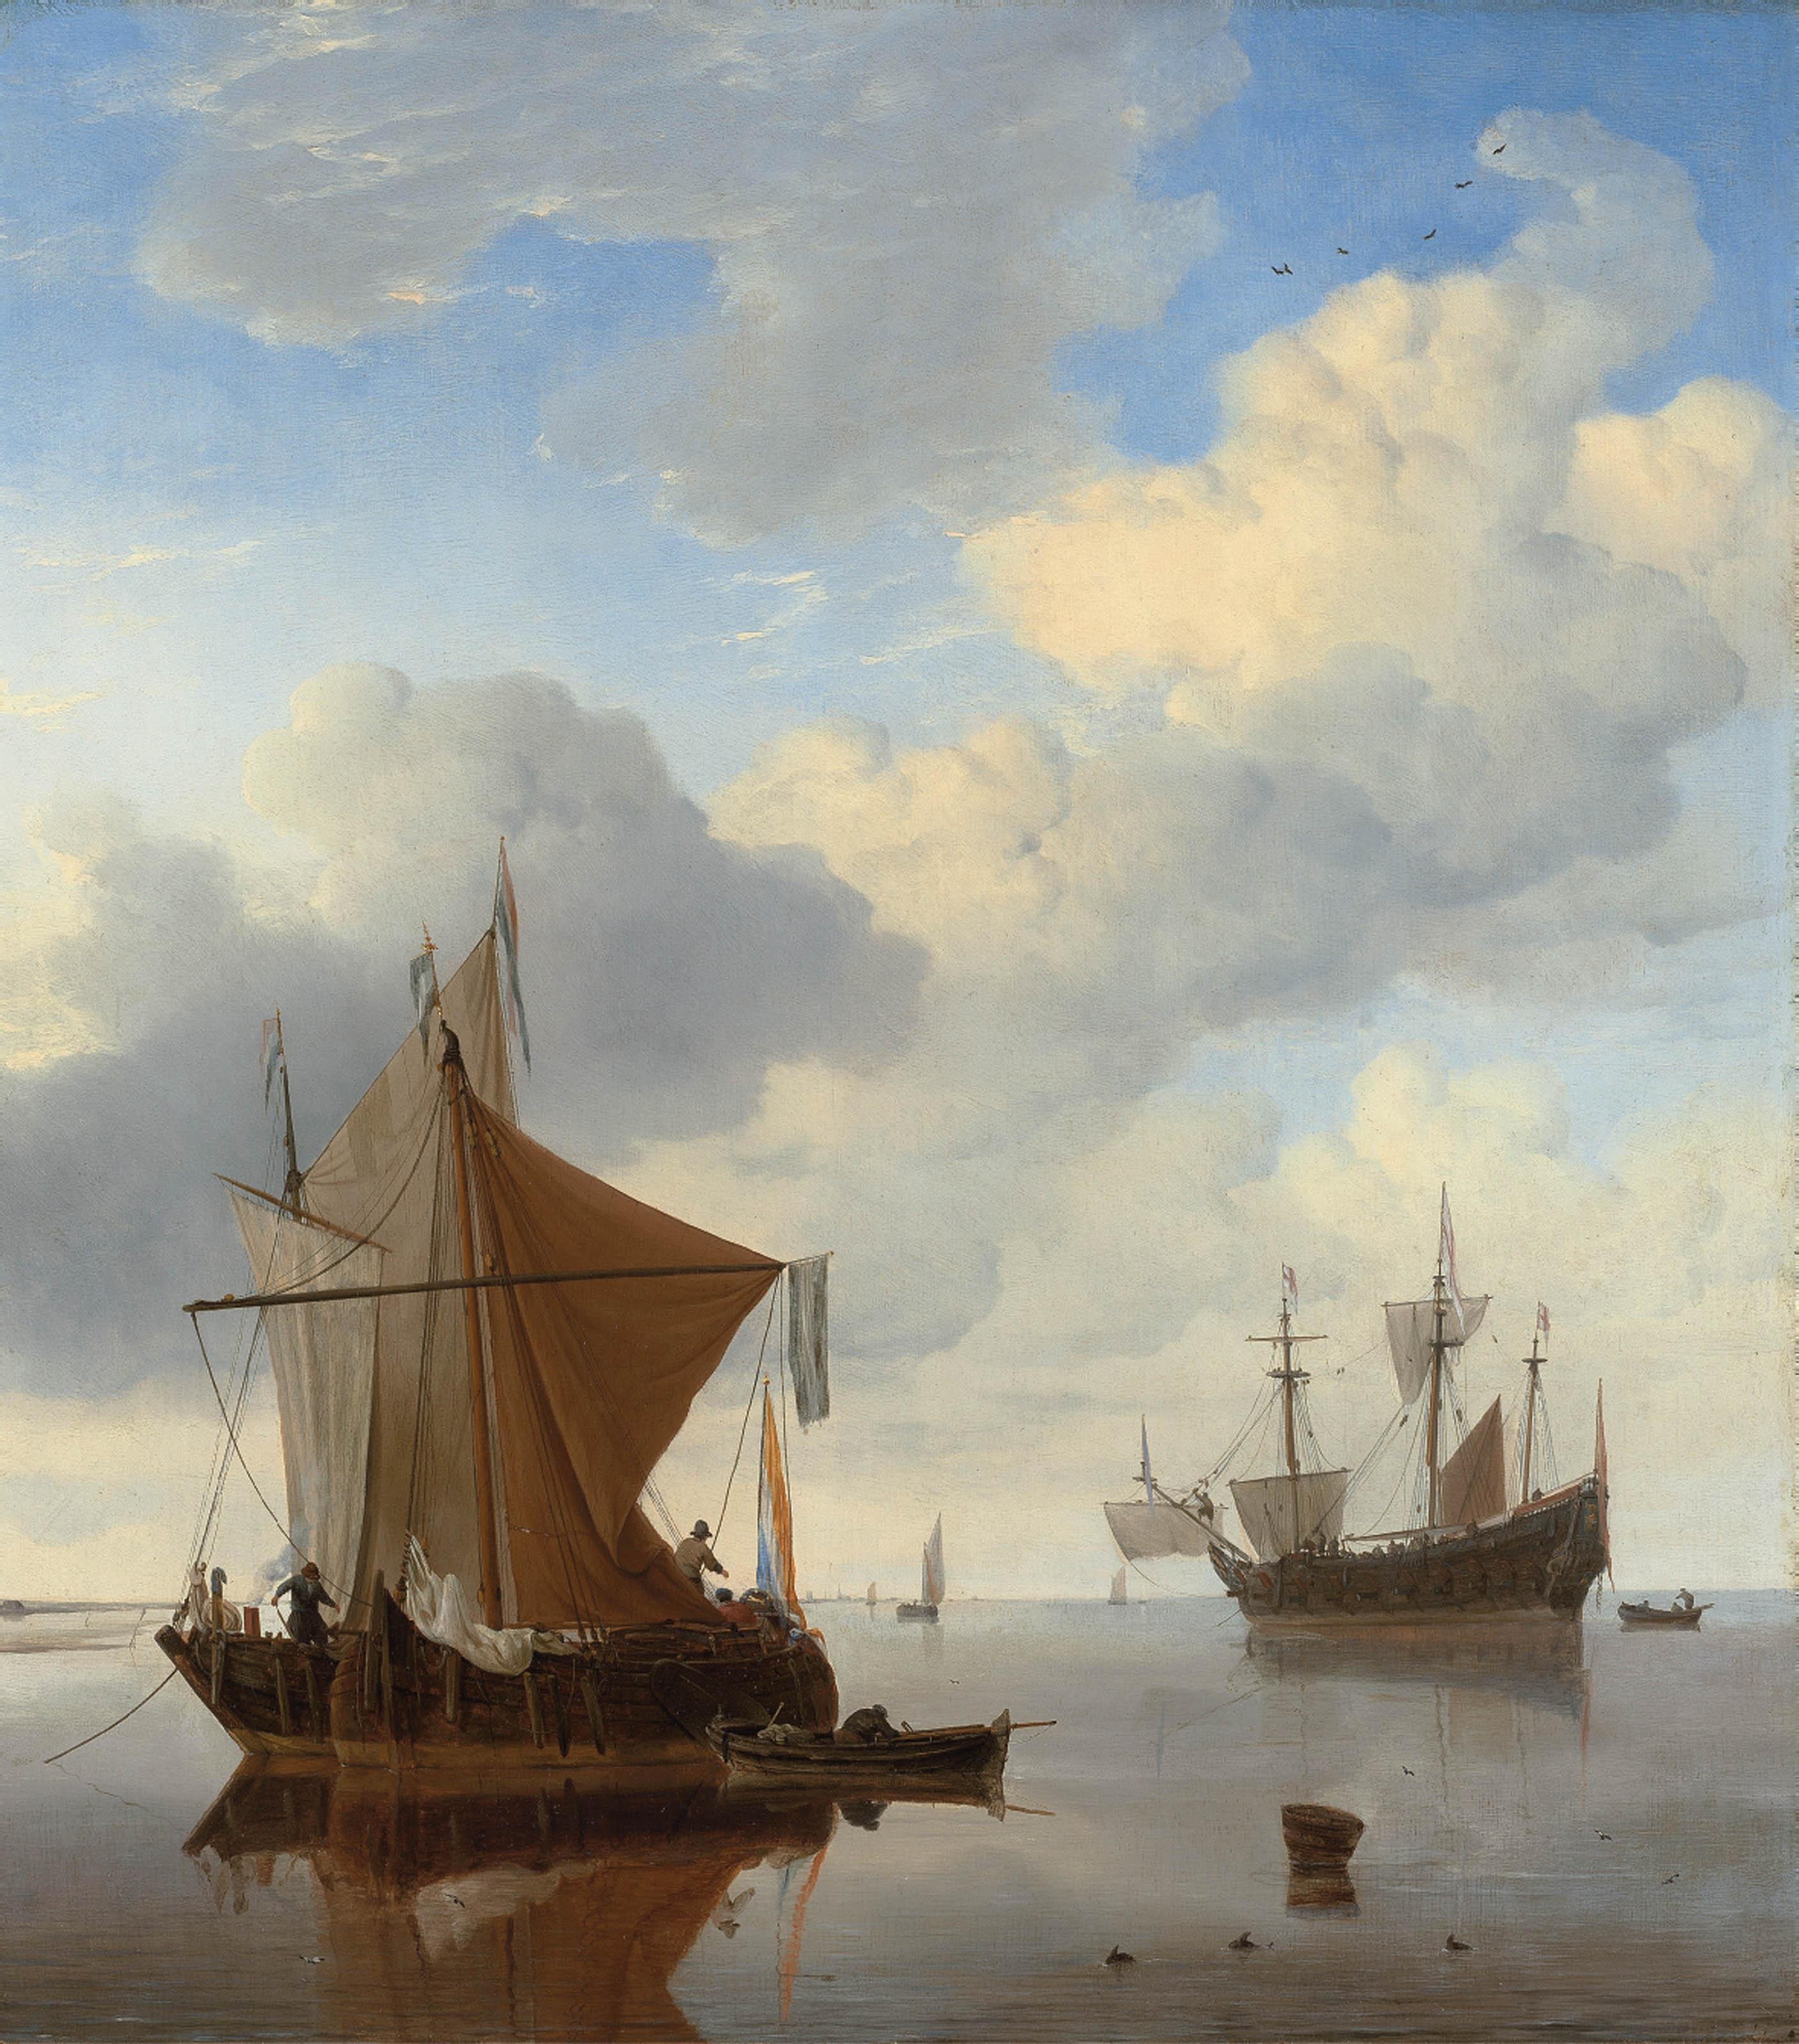 A Calm - A smalschip and a kaag at anchor with an English man-o'-war beyond